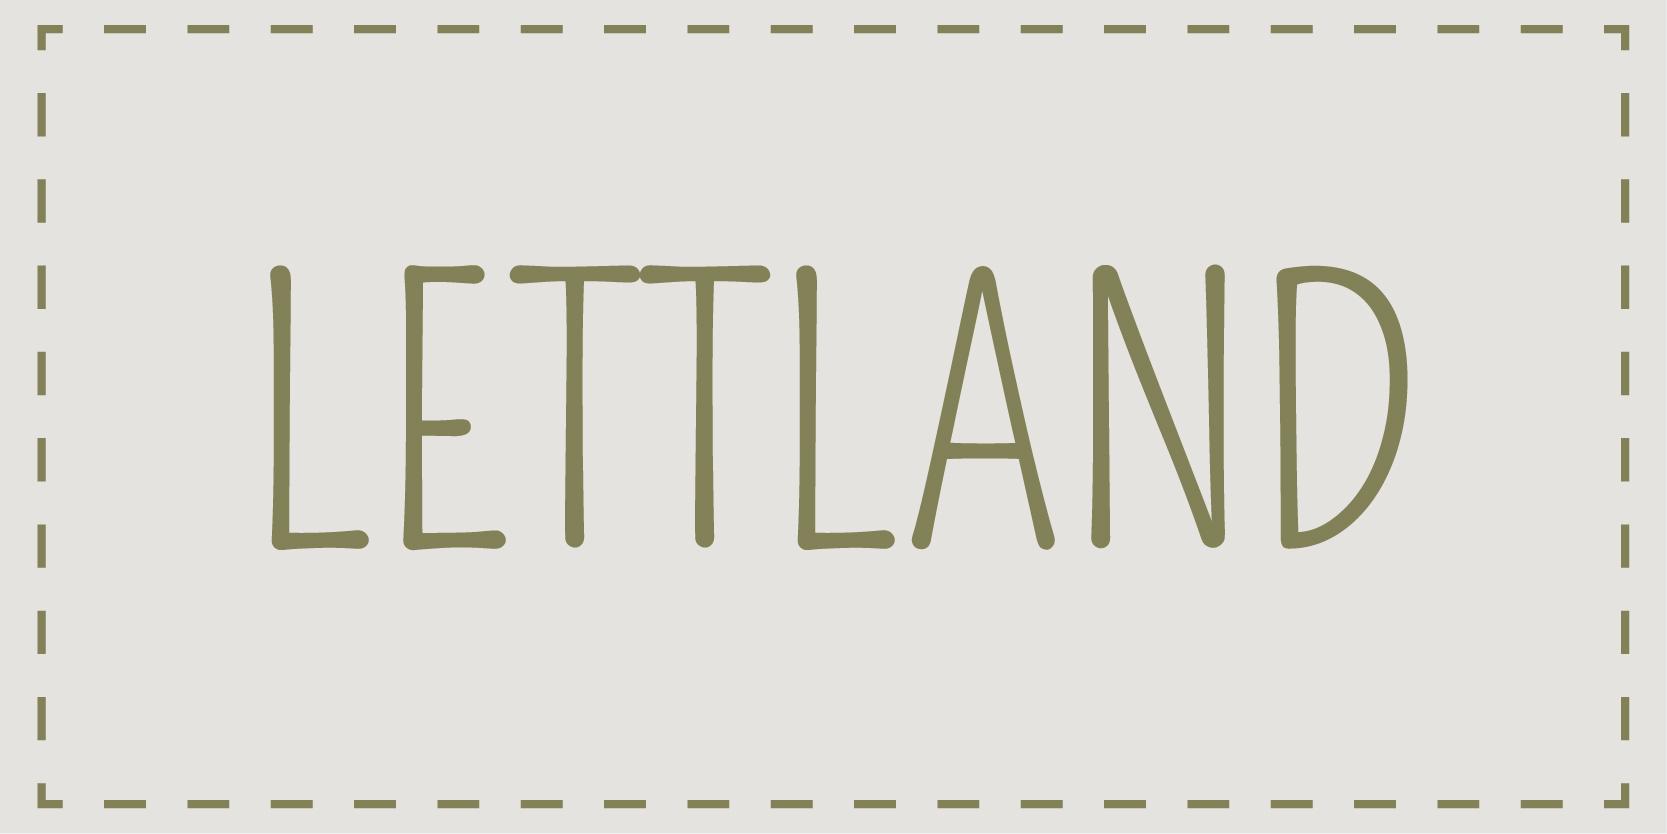 lettland+resmål+guide+blogg